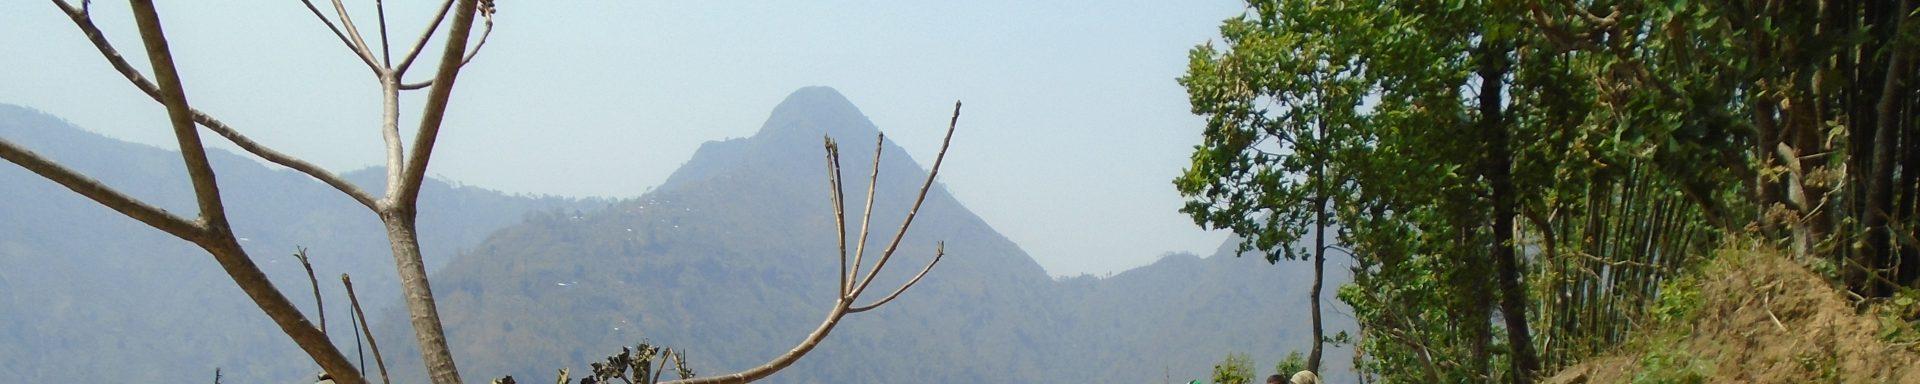 Dorre landbouwgrond in Nepal